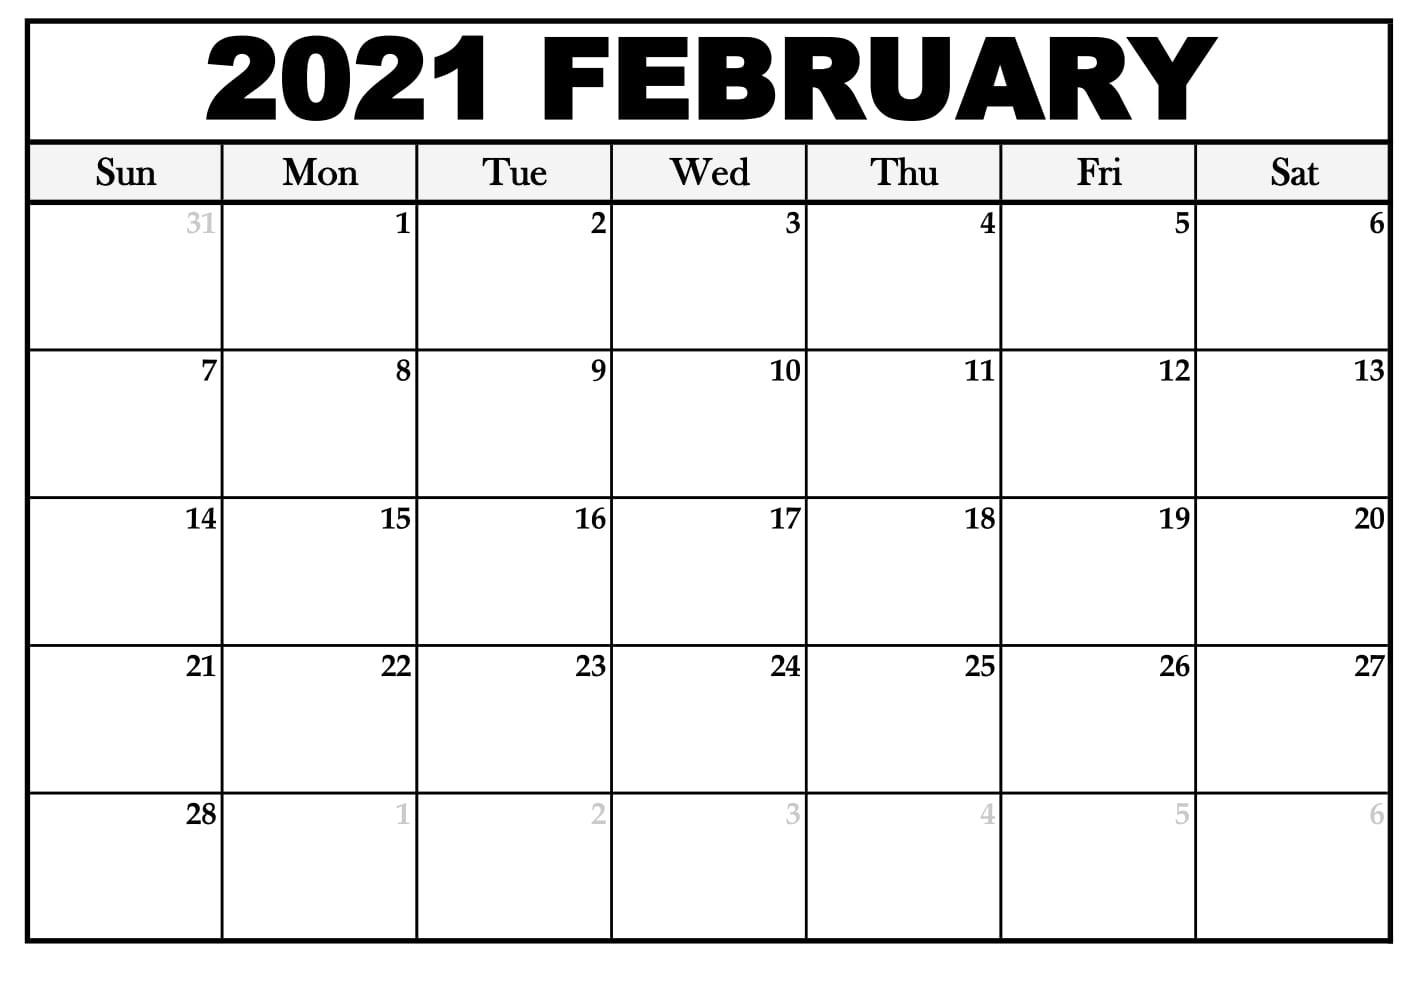 Printable February 2021 Calendar With Notes | Betacalender4U